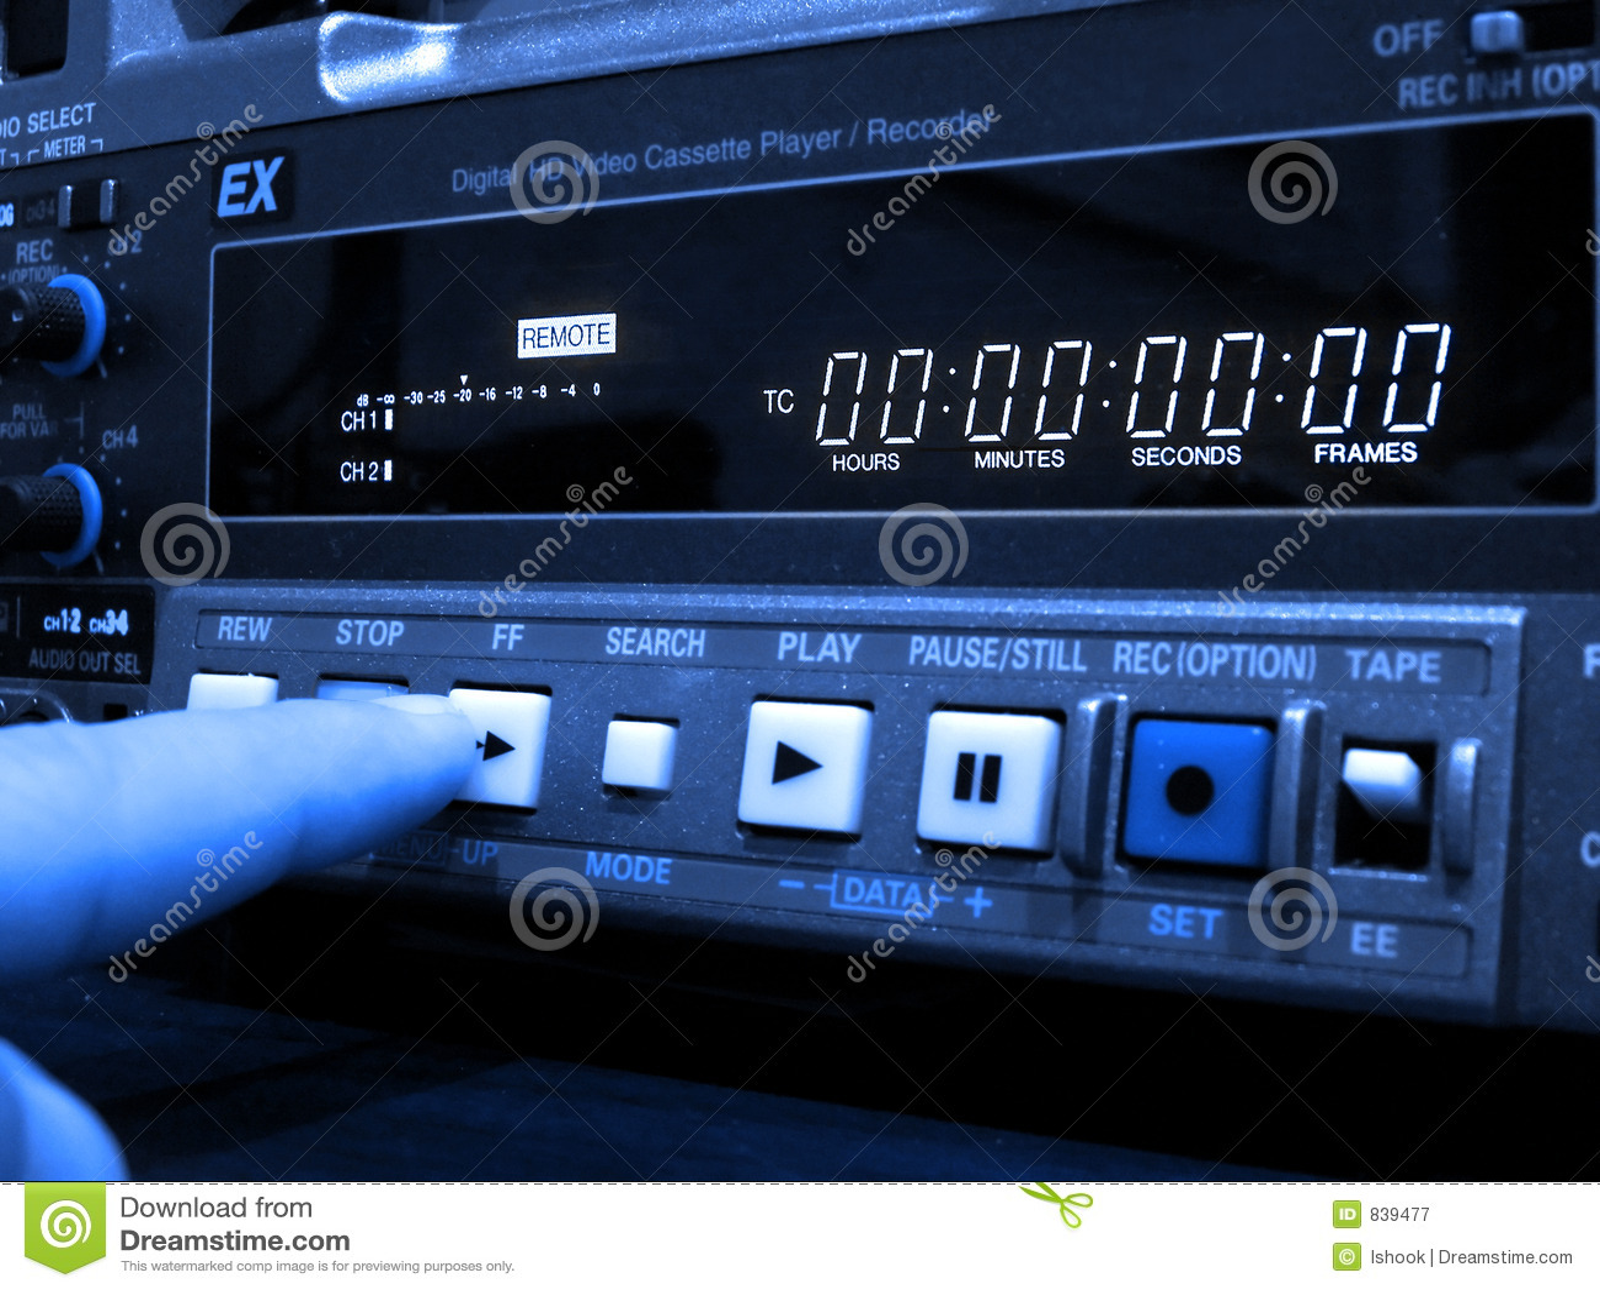 Professional VCR